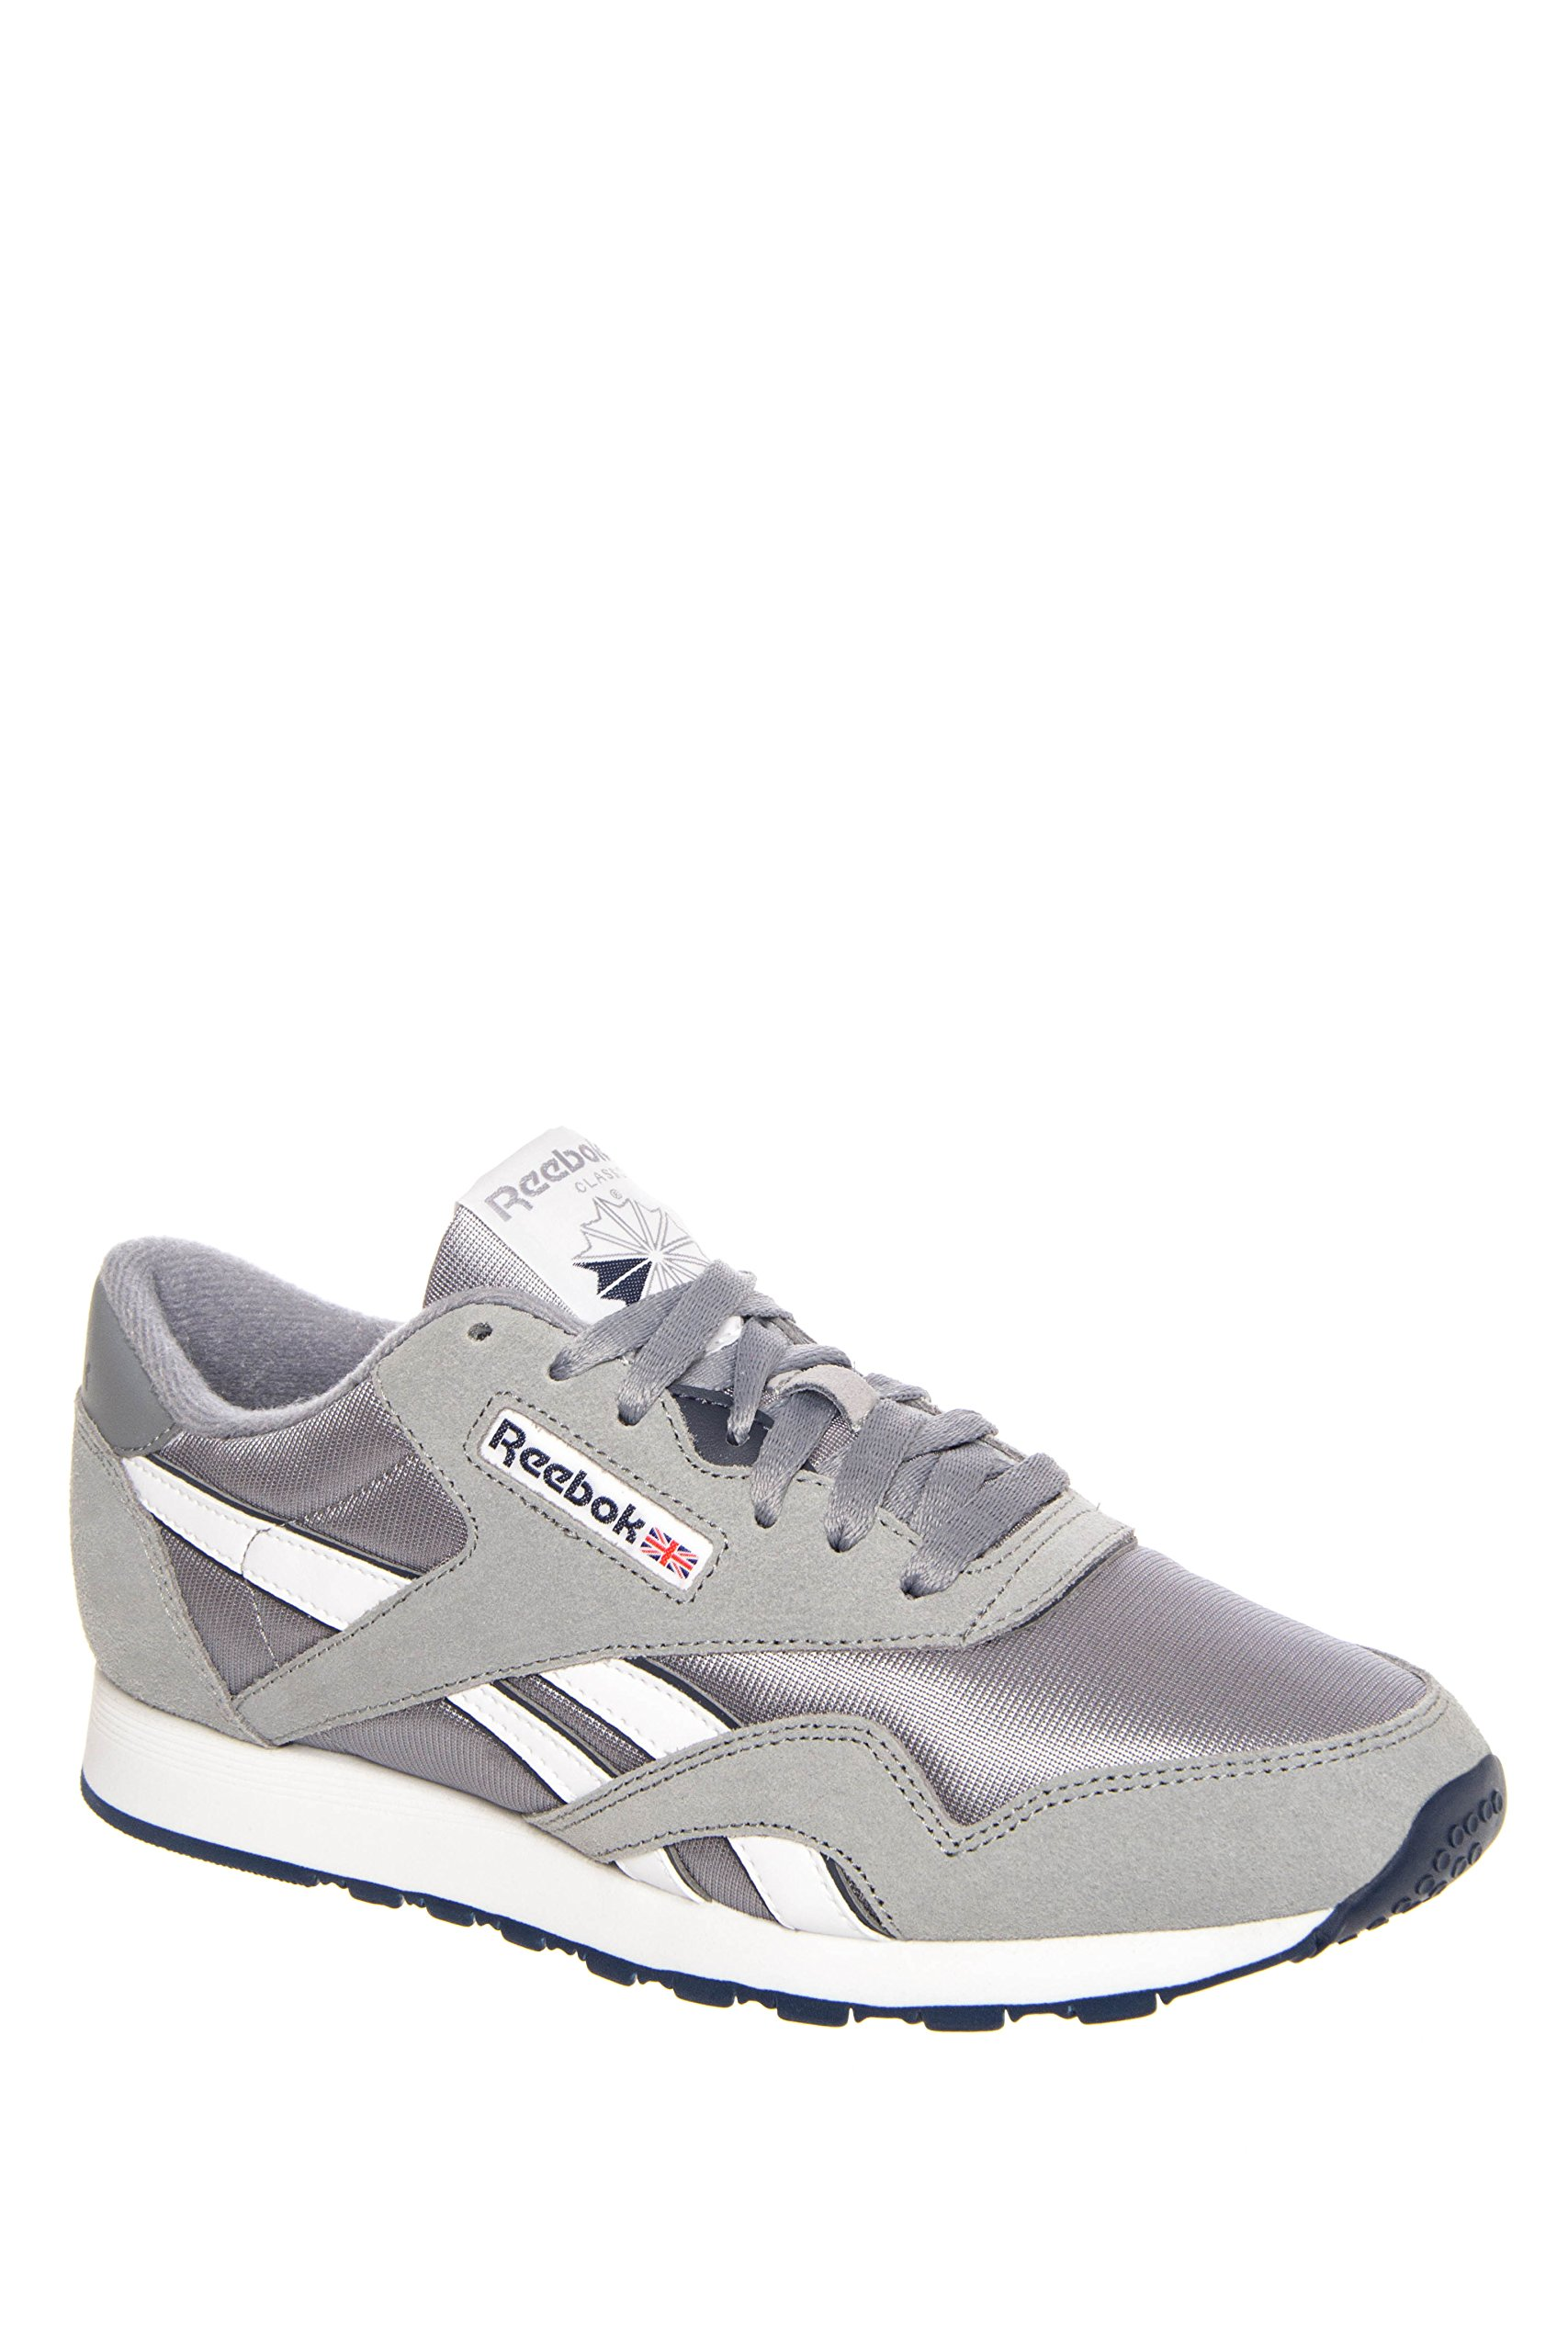 6821b085988c5 Reebok Men s CL NYLON Classic Sneaker